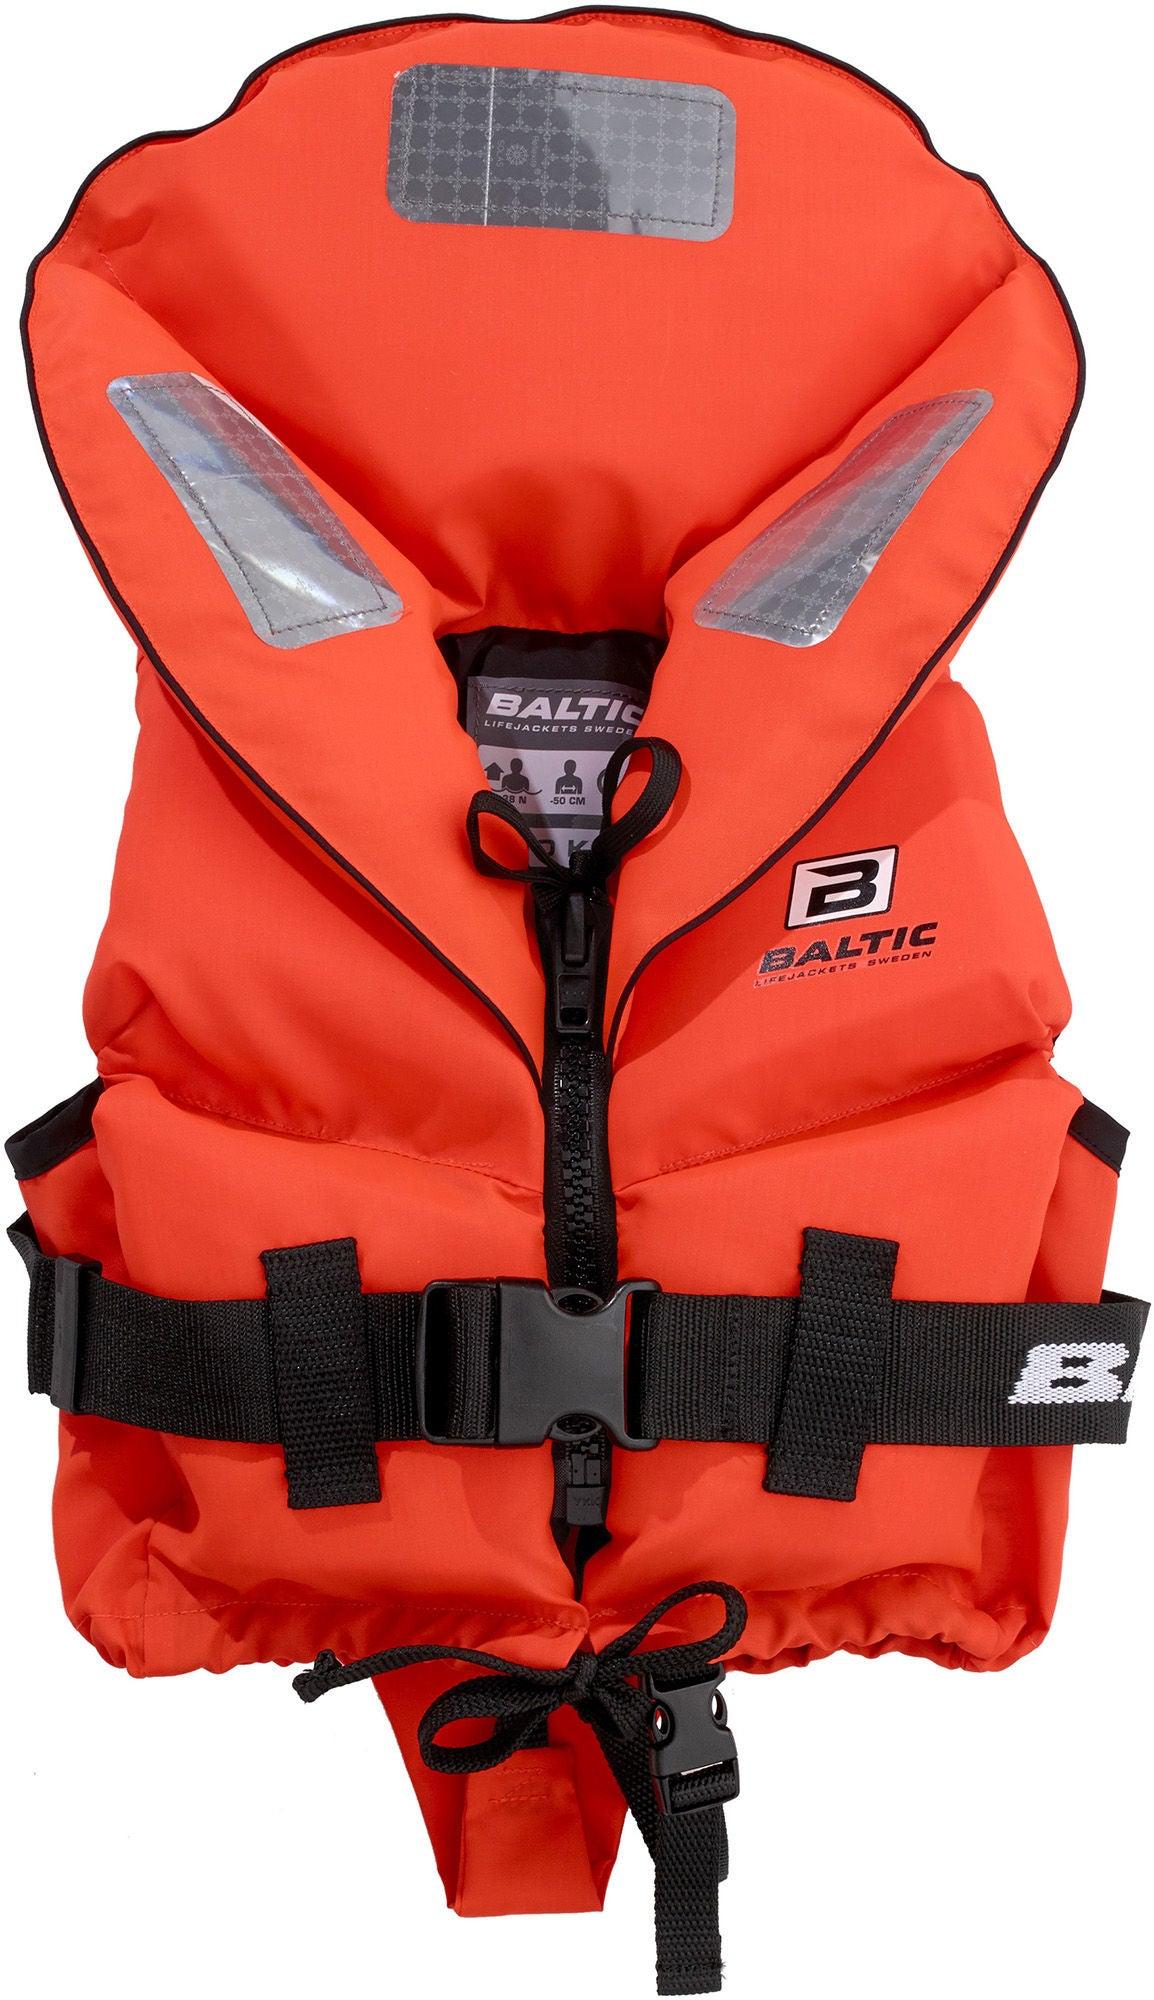 Baltic Pro Sailor Redningsvest 10-20 kg, Oransje